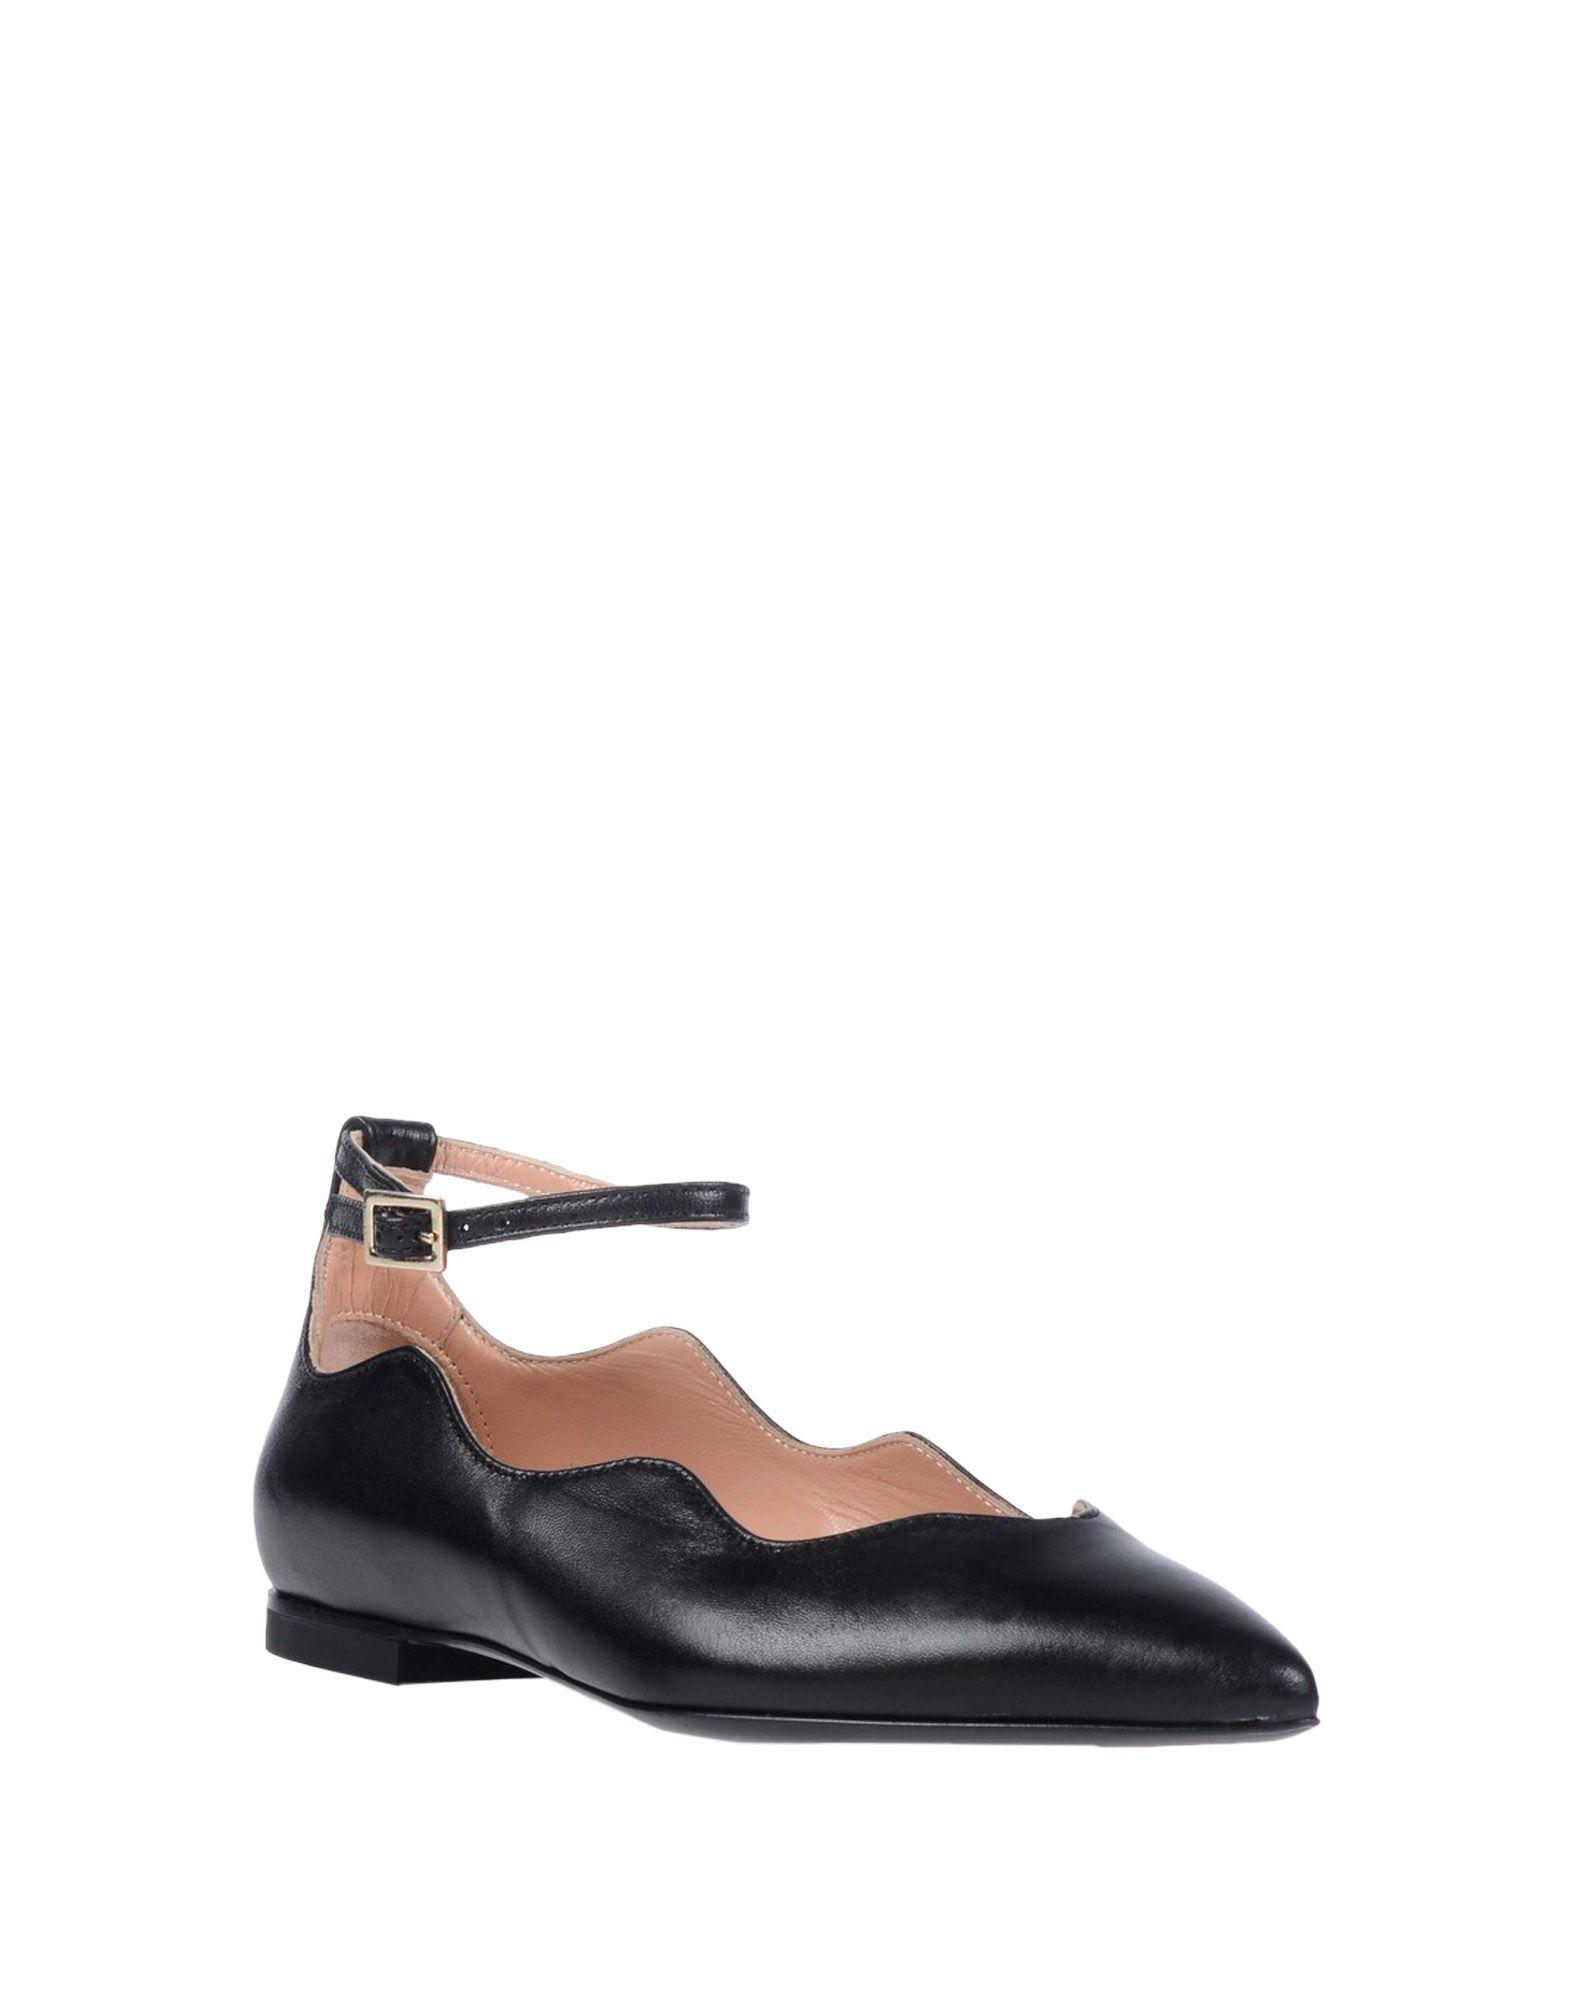 Stilvolle billige Schuhe 11520247DM Suoli Ballerinas Damen  11520247DM Schuhe ad4793